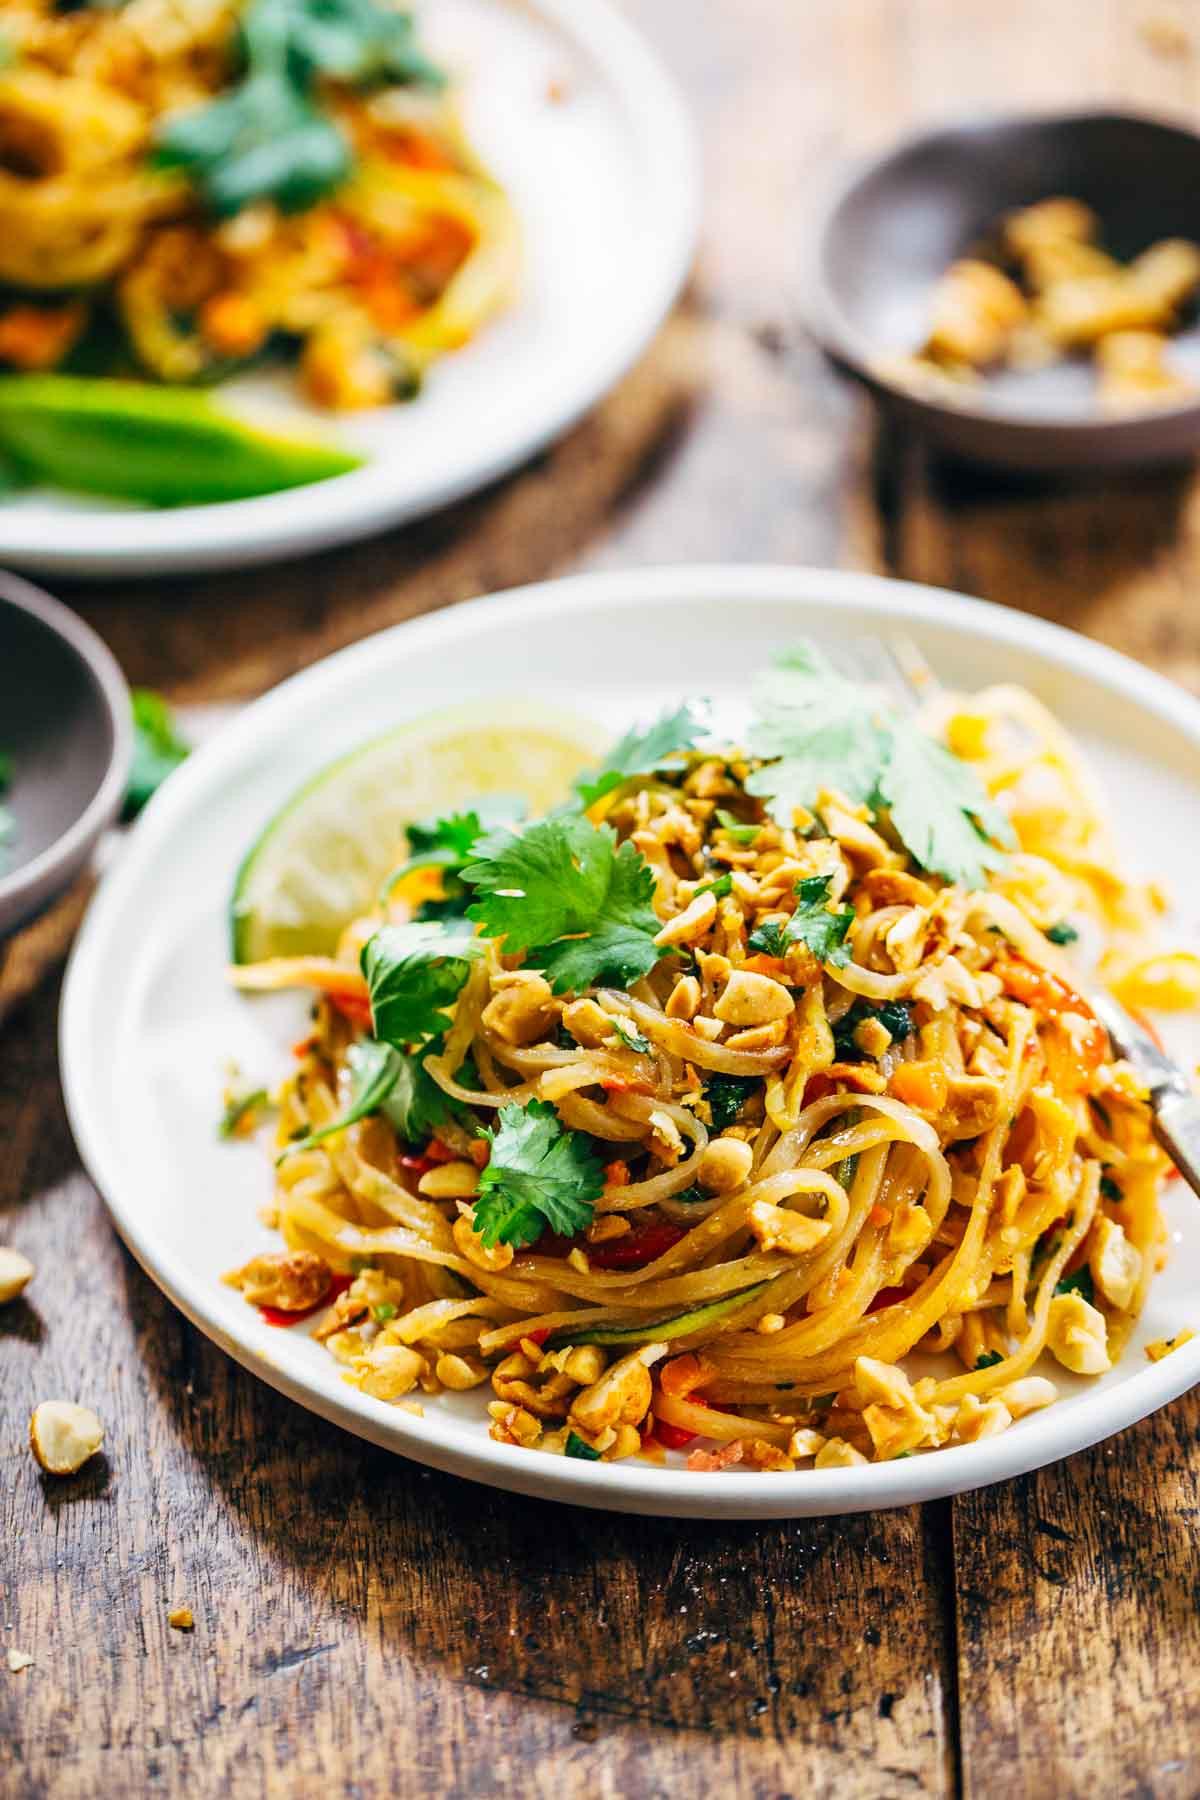 Vegetarian Dinner Recipes  Rainbow Ve arian Pad Thai with Peanuts and Basil Recipe